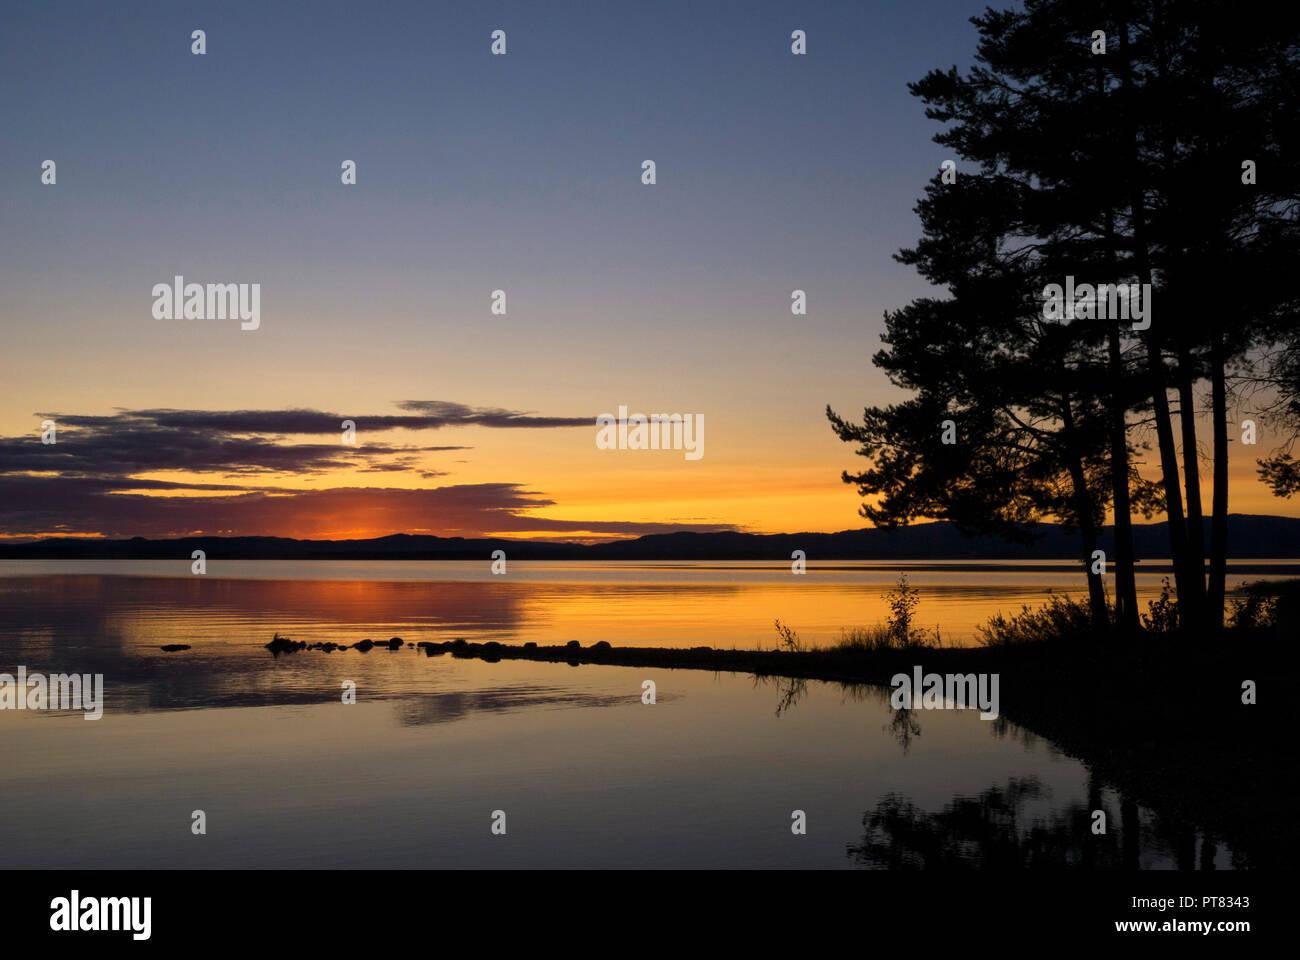 Susnset at lake Orsa - Stock Image